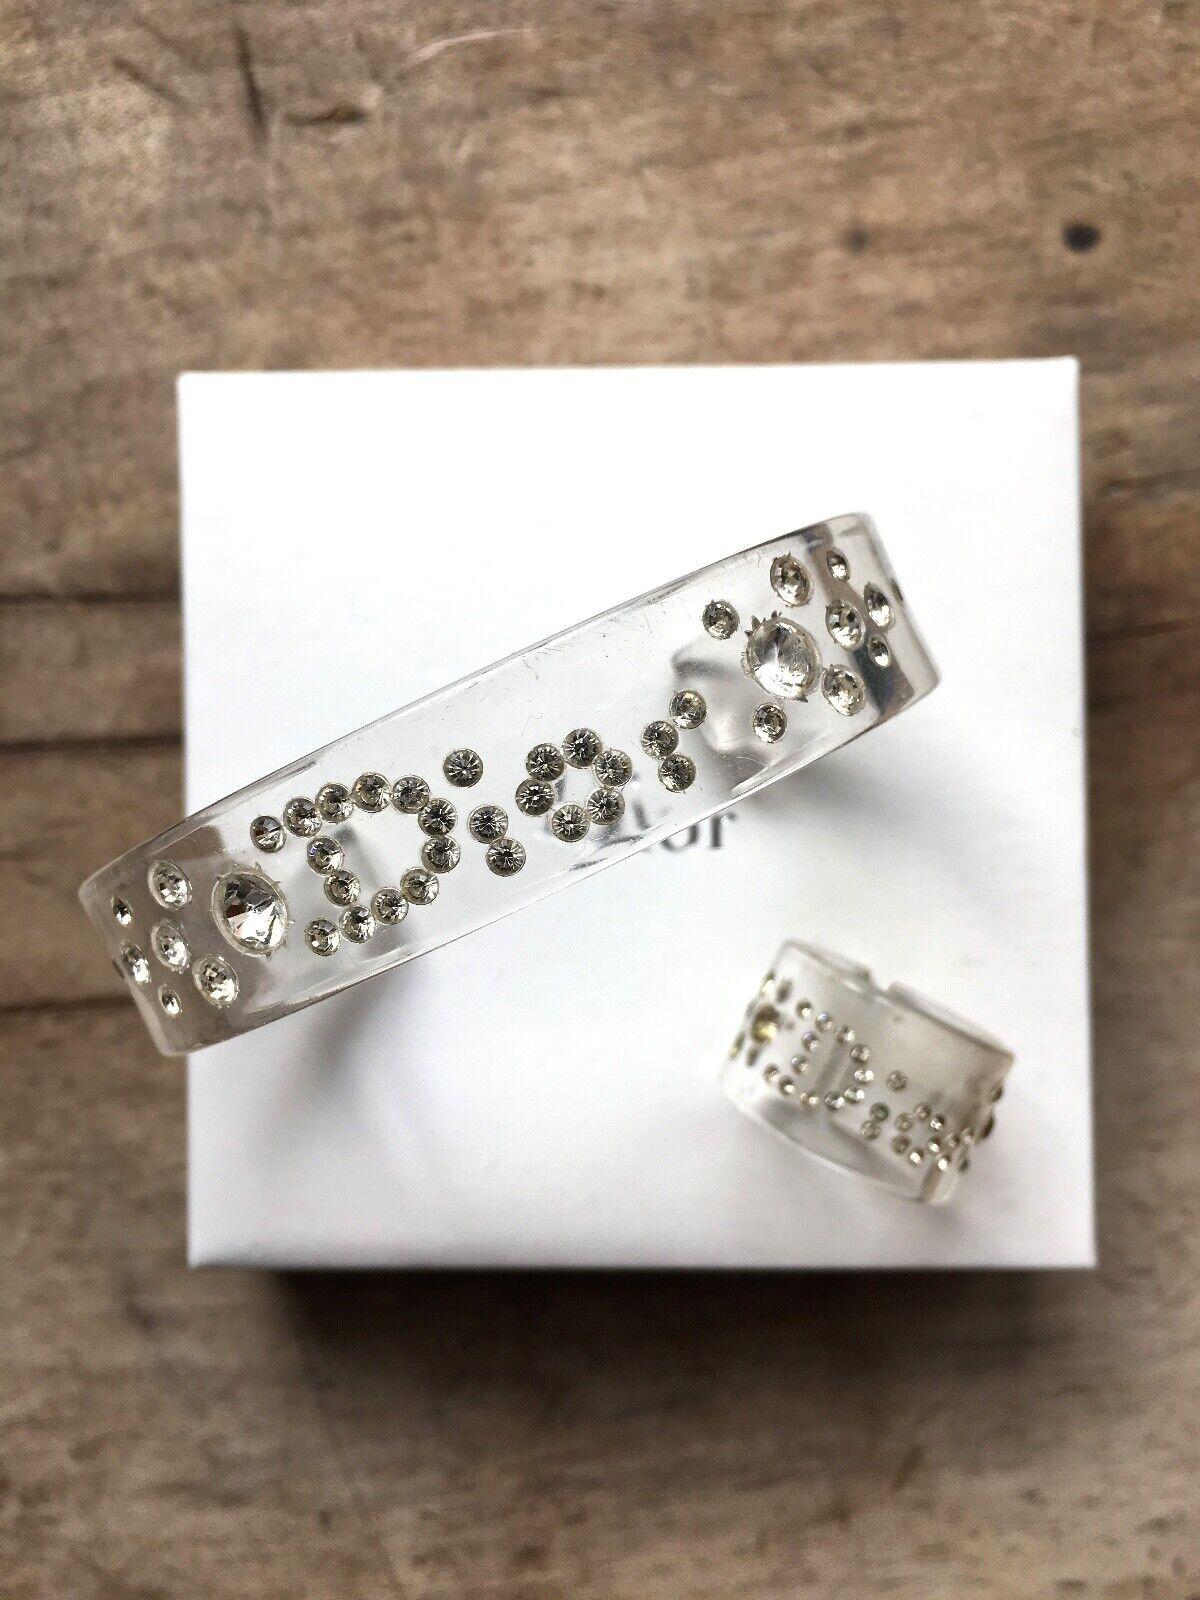 Dior parure bracelet bague perspex swarovski dior lucite bracelet ring galliano